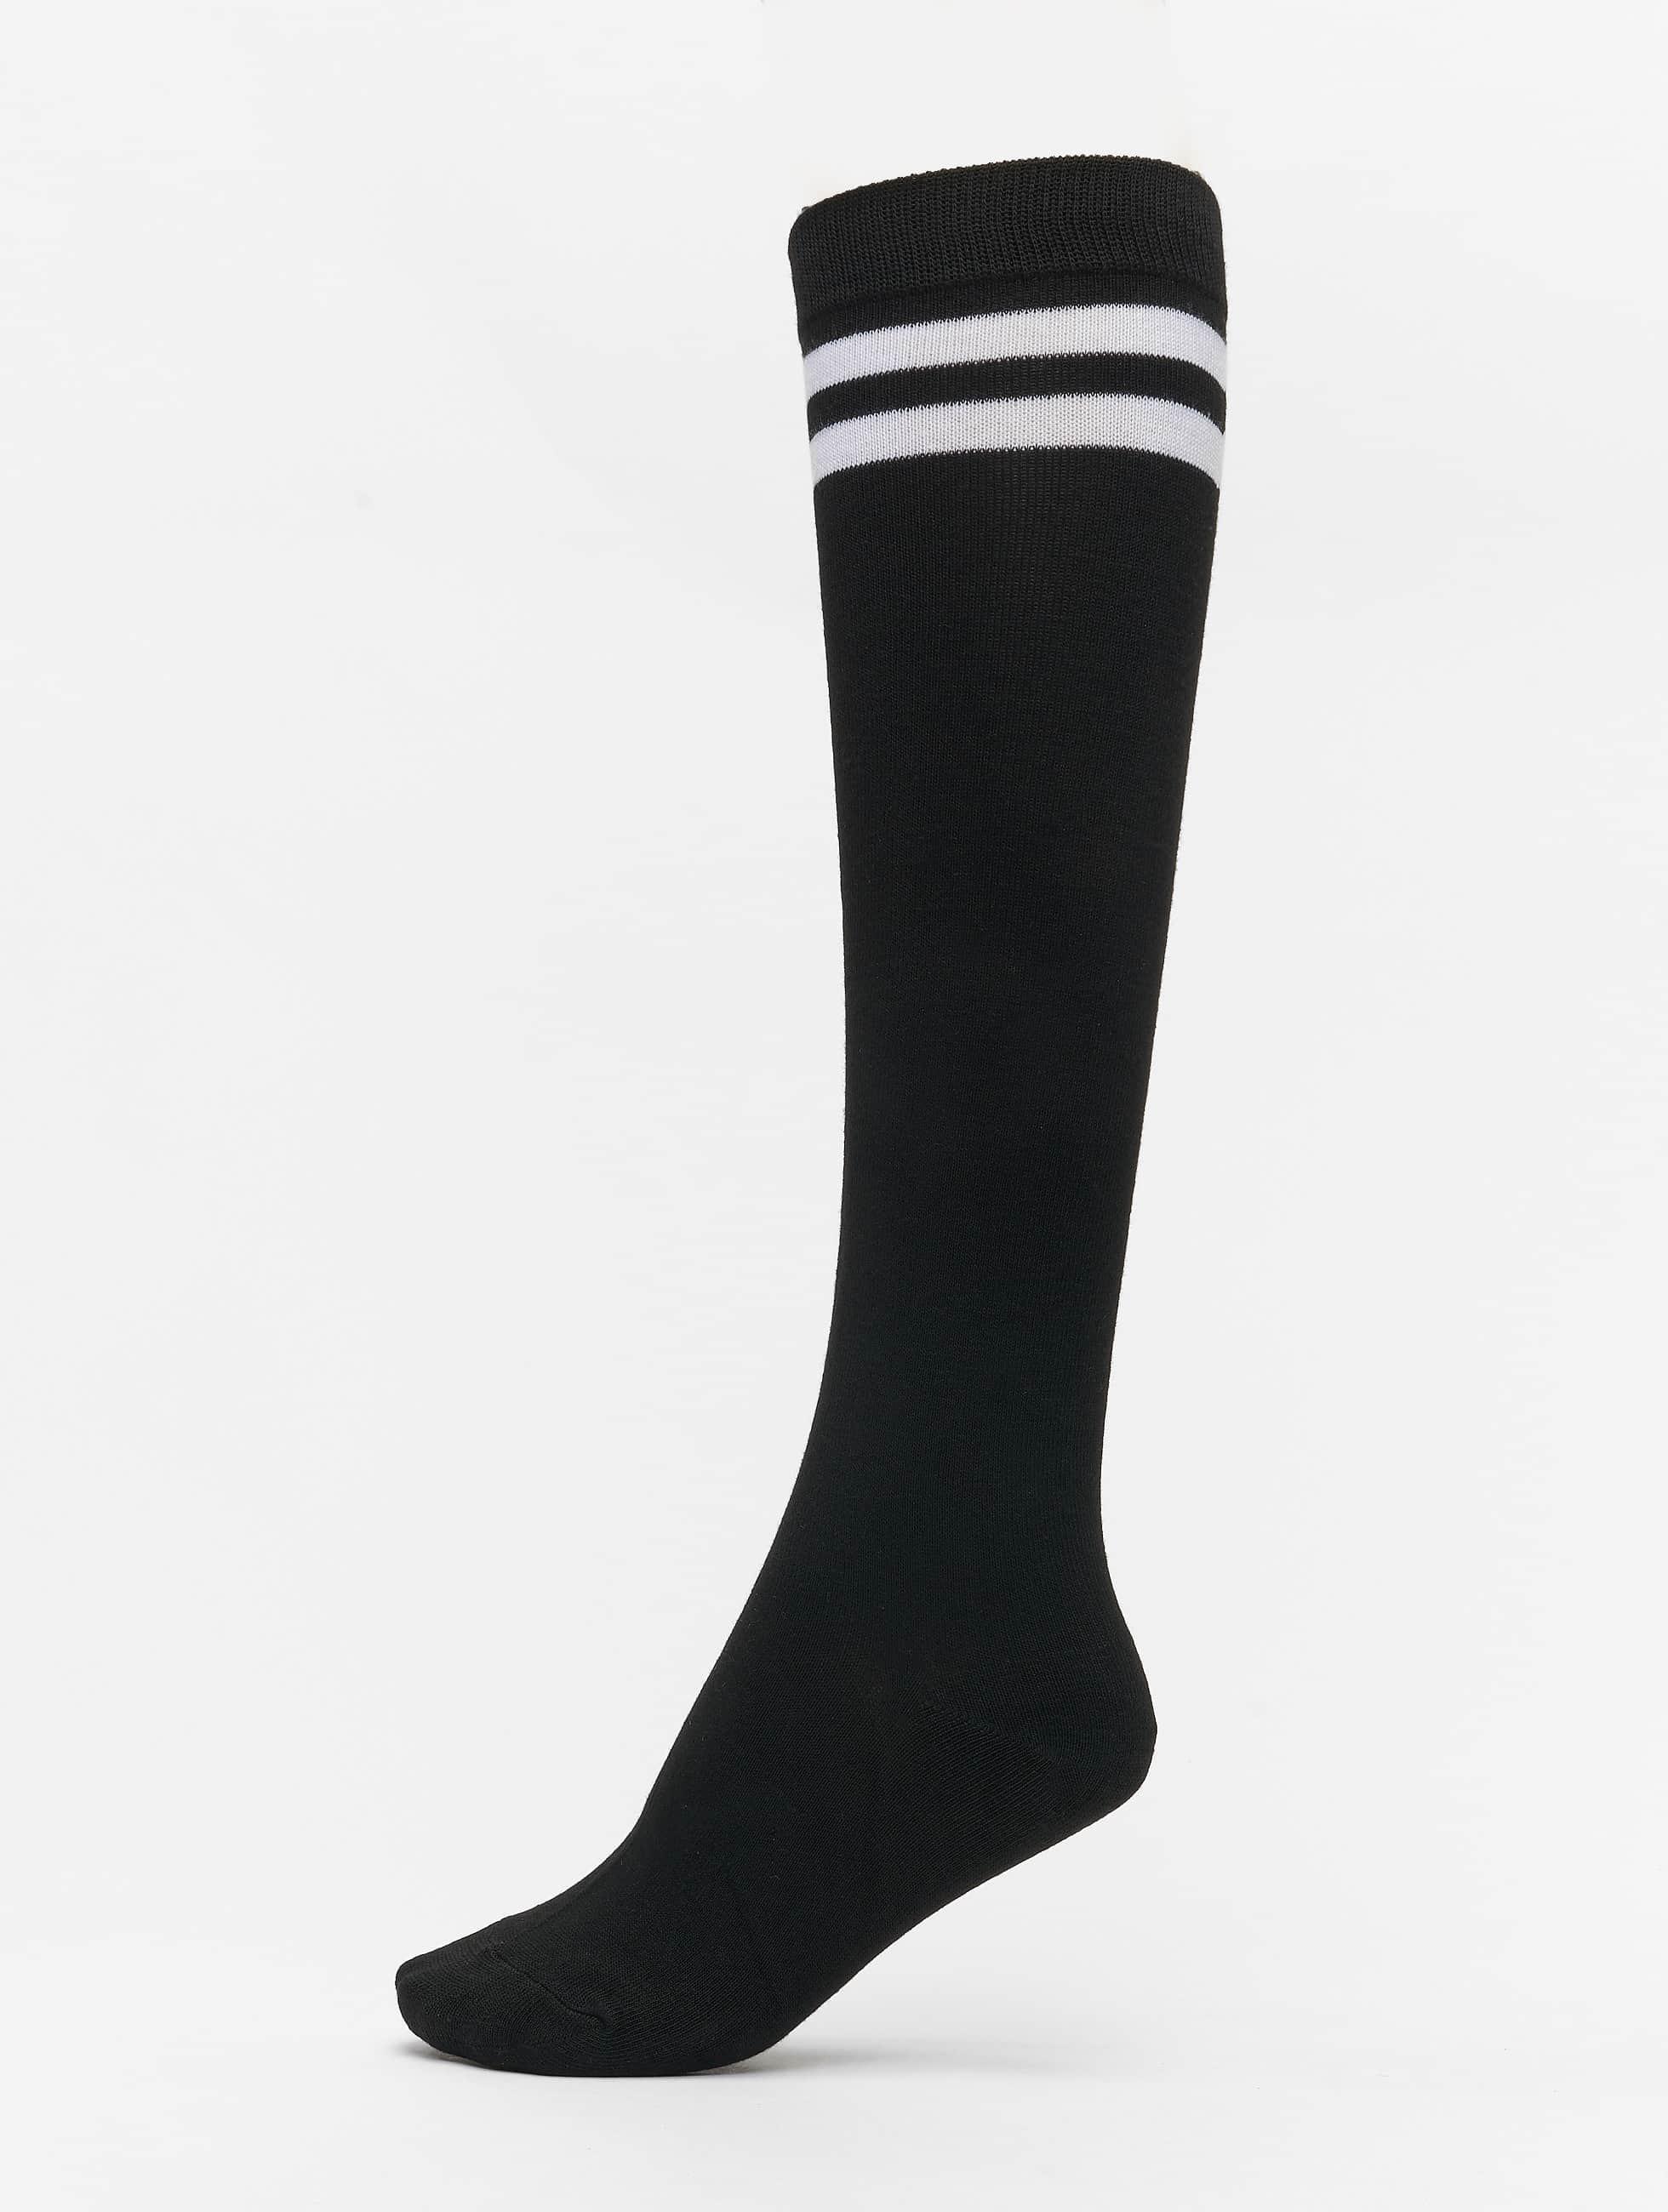 Urban Classics Frauen Socken College in schwarz